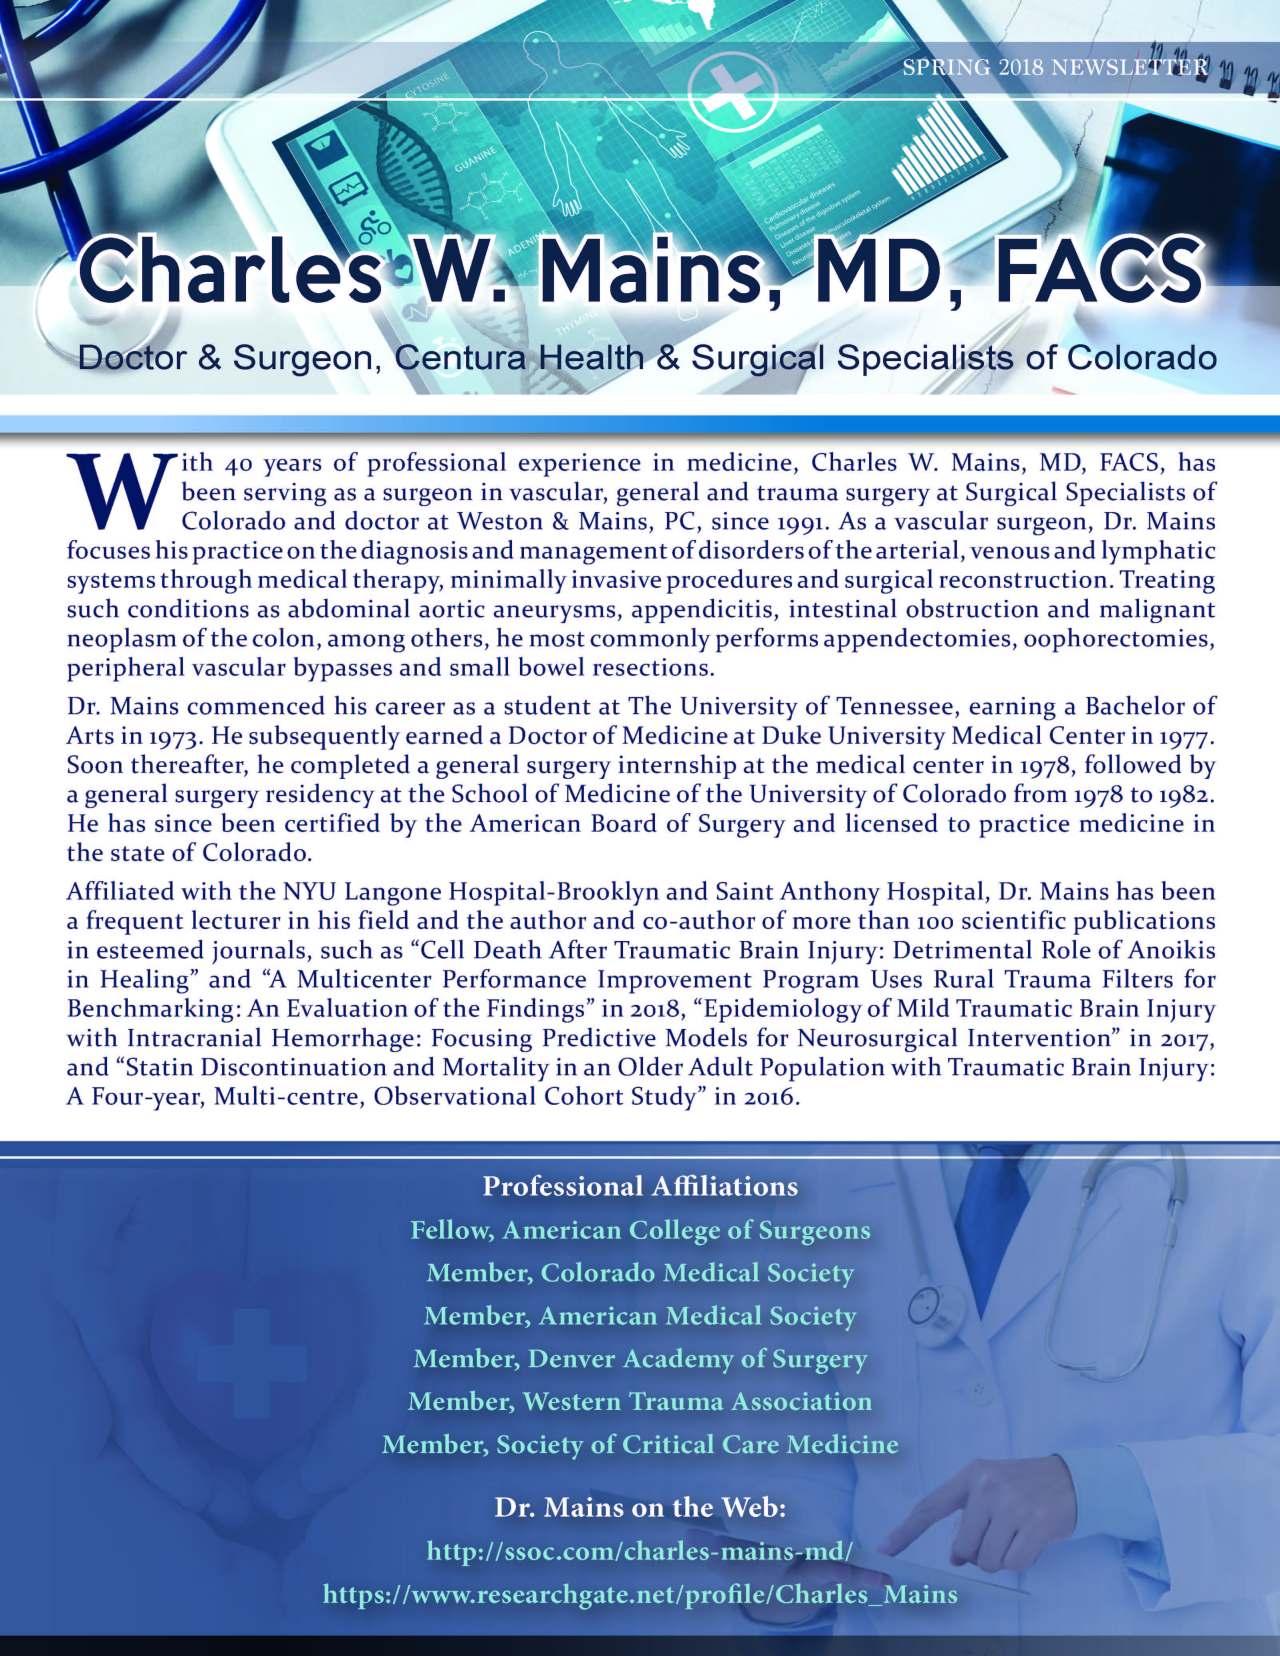 Charles W. Mains